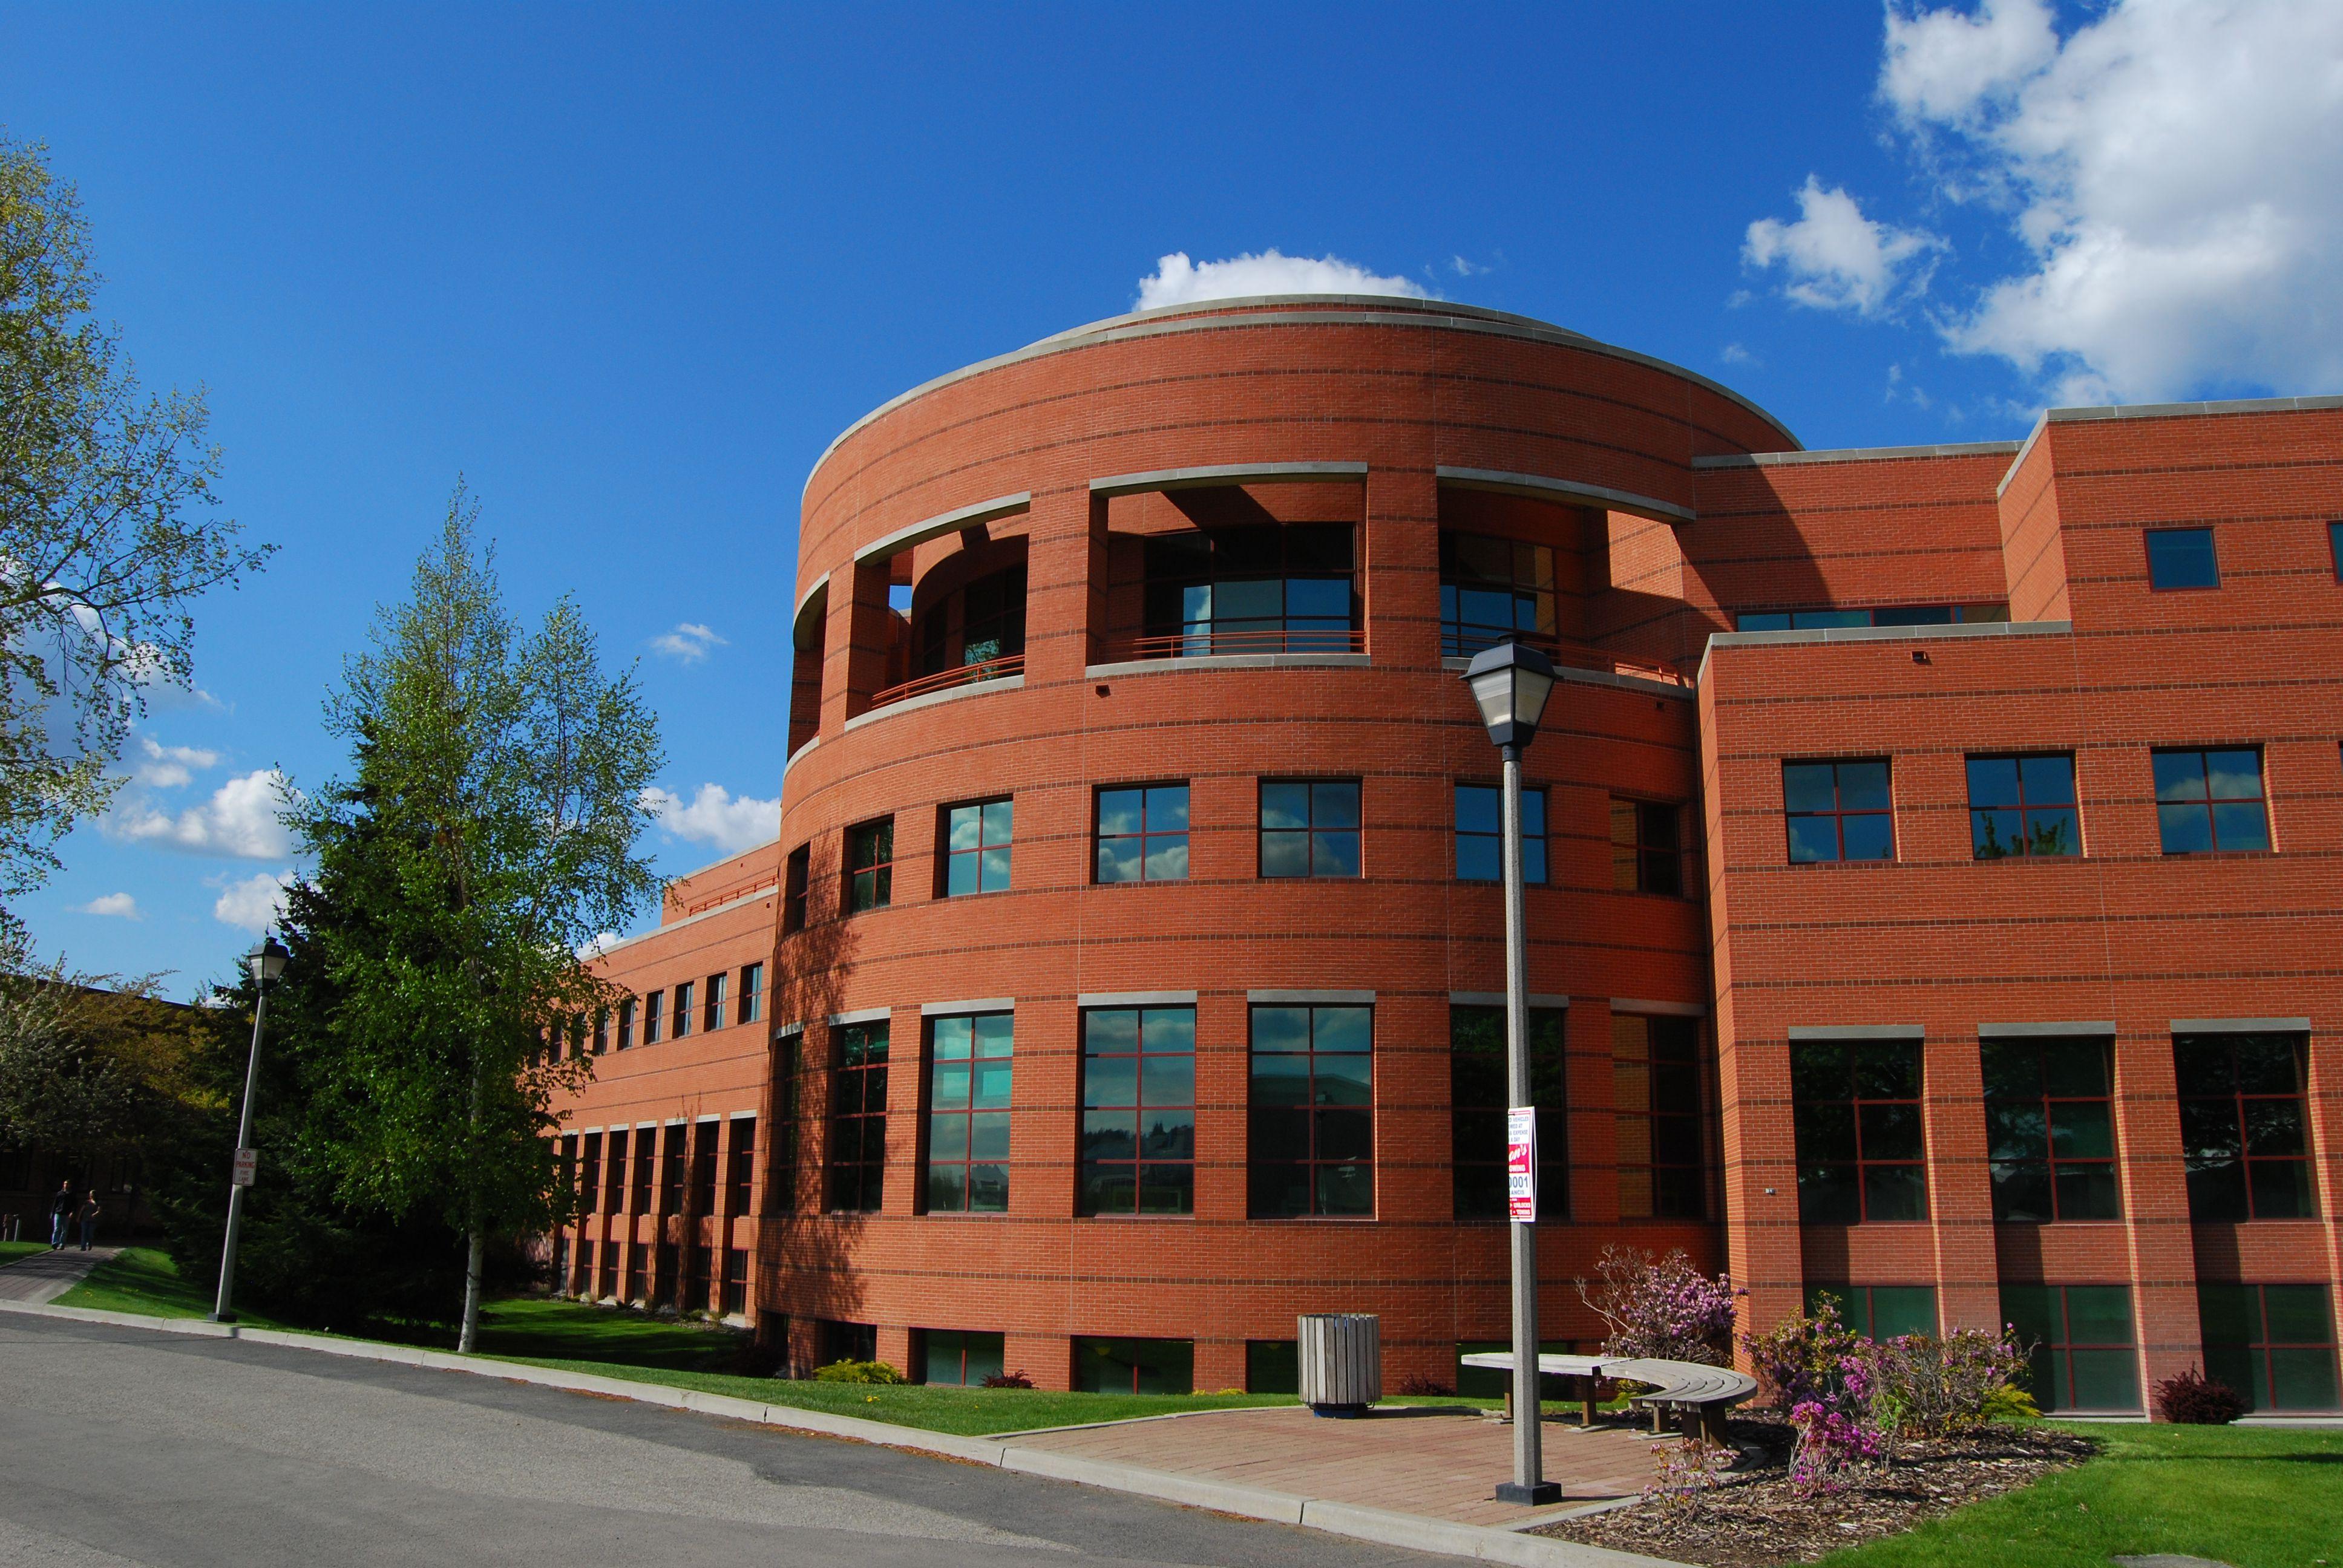 Gonzaga University—Foley Center Library